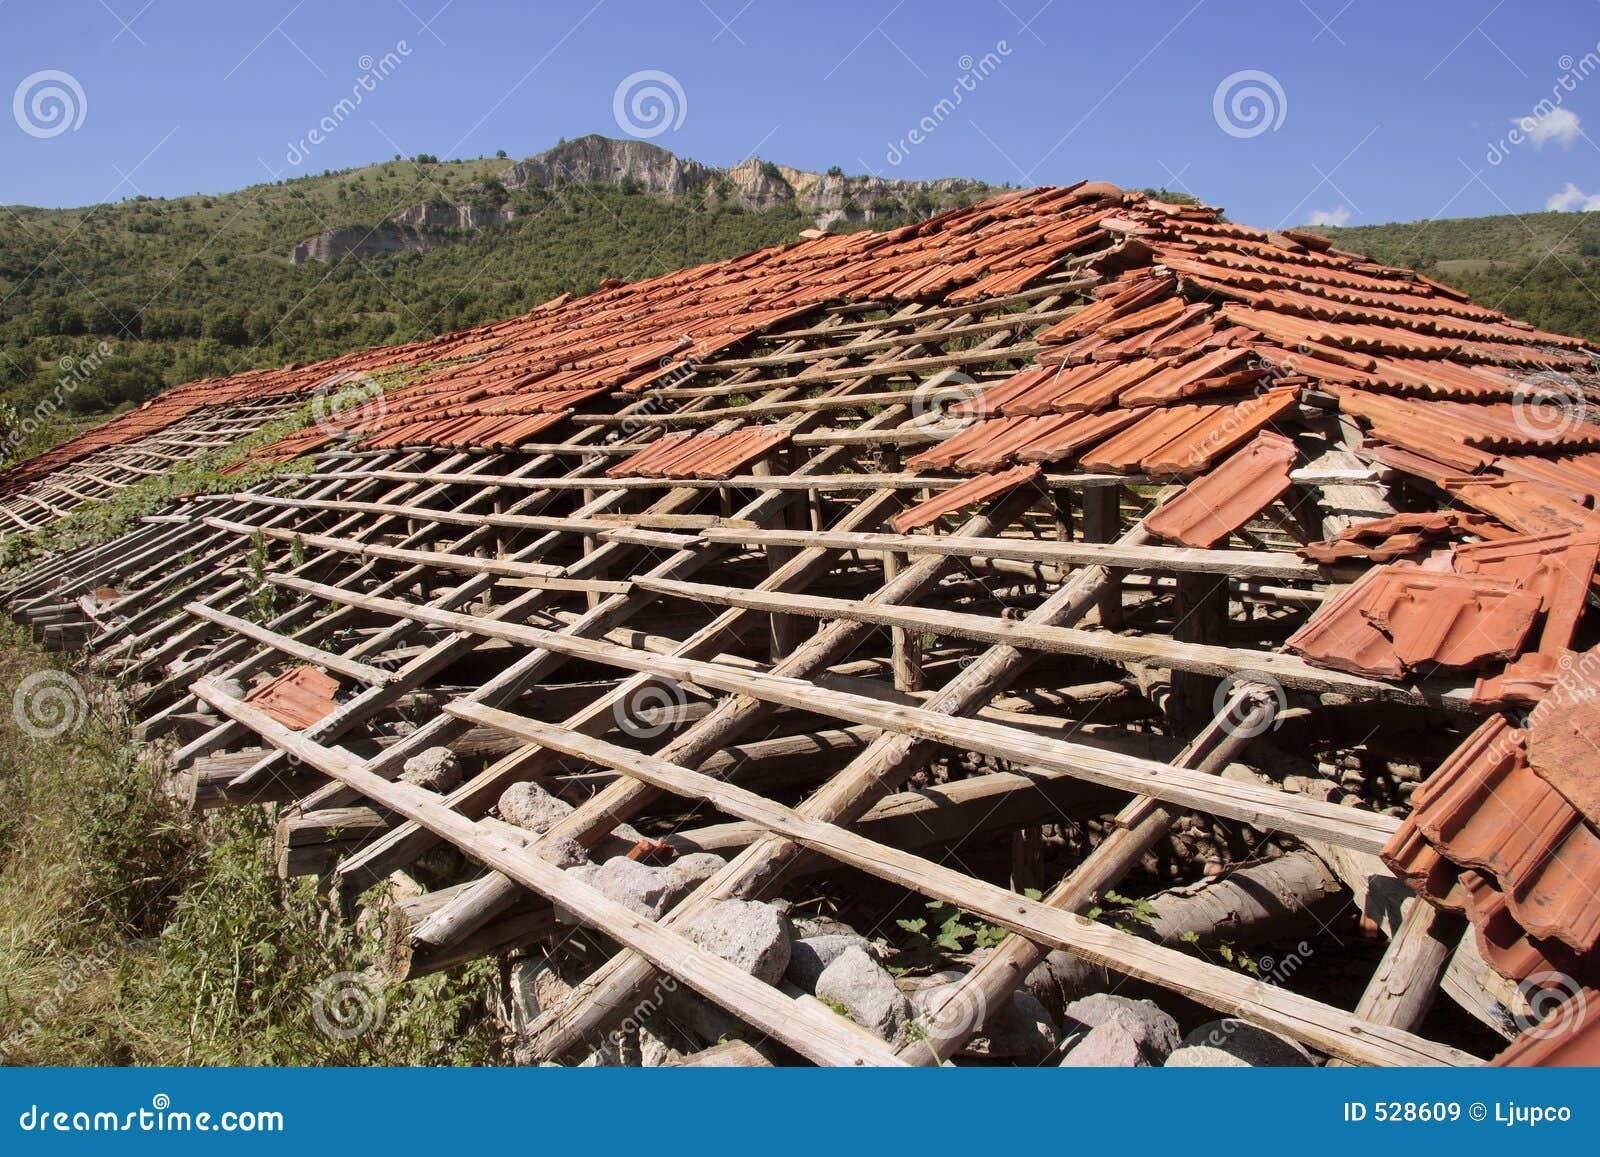 Download 被放弃的损坏的房子屋顶 库存图片. 图片 包括有 拱道, 爆破, 布琼布拉, 长满的, 颜色, 年龄, 庄园 - 528609